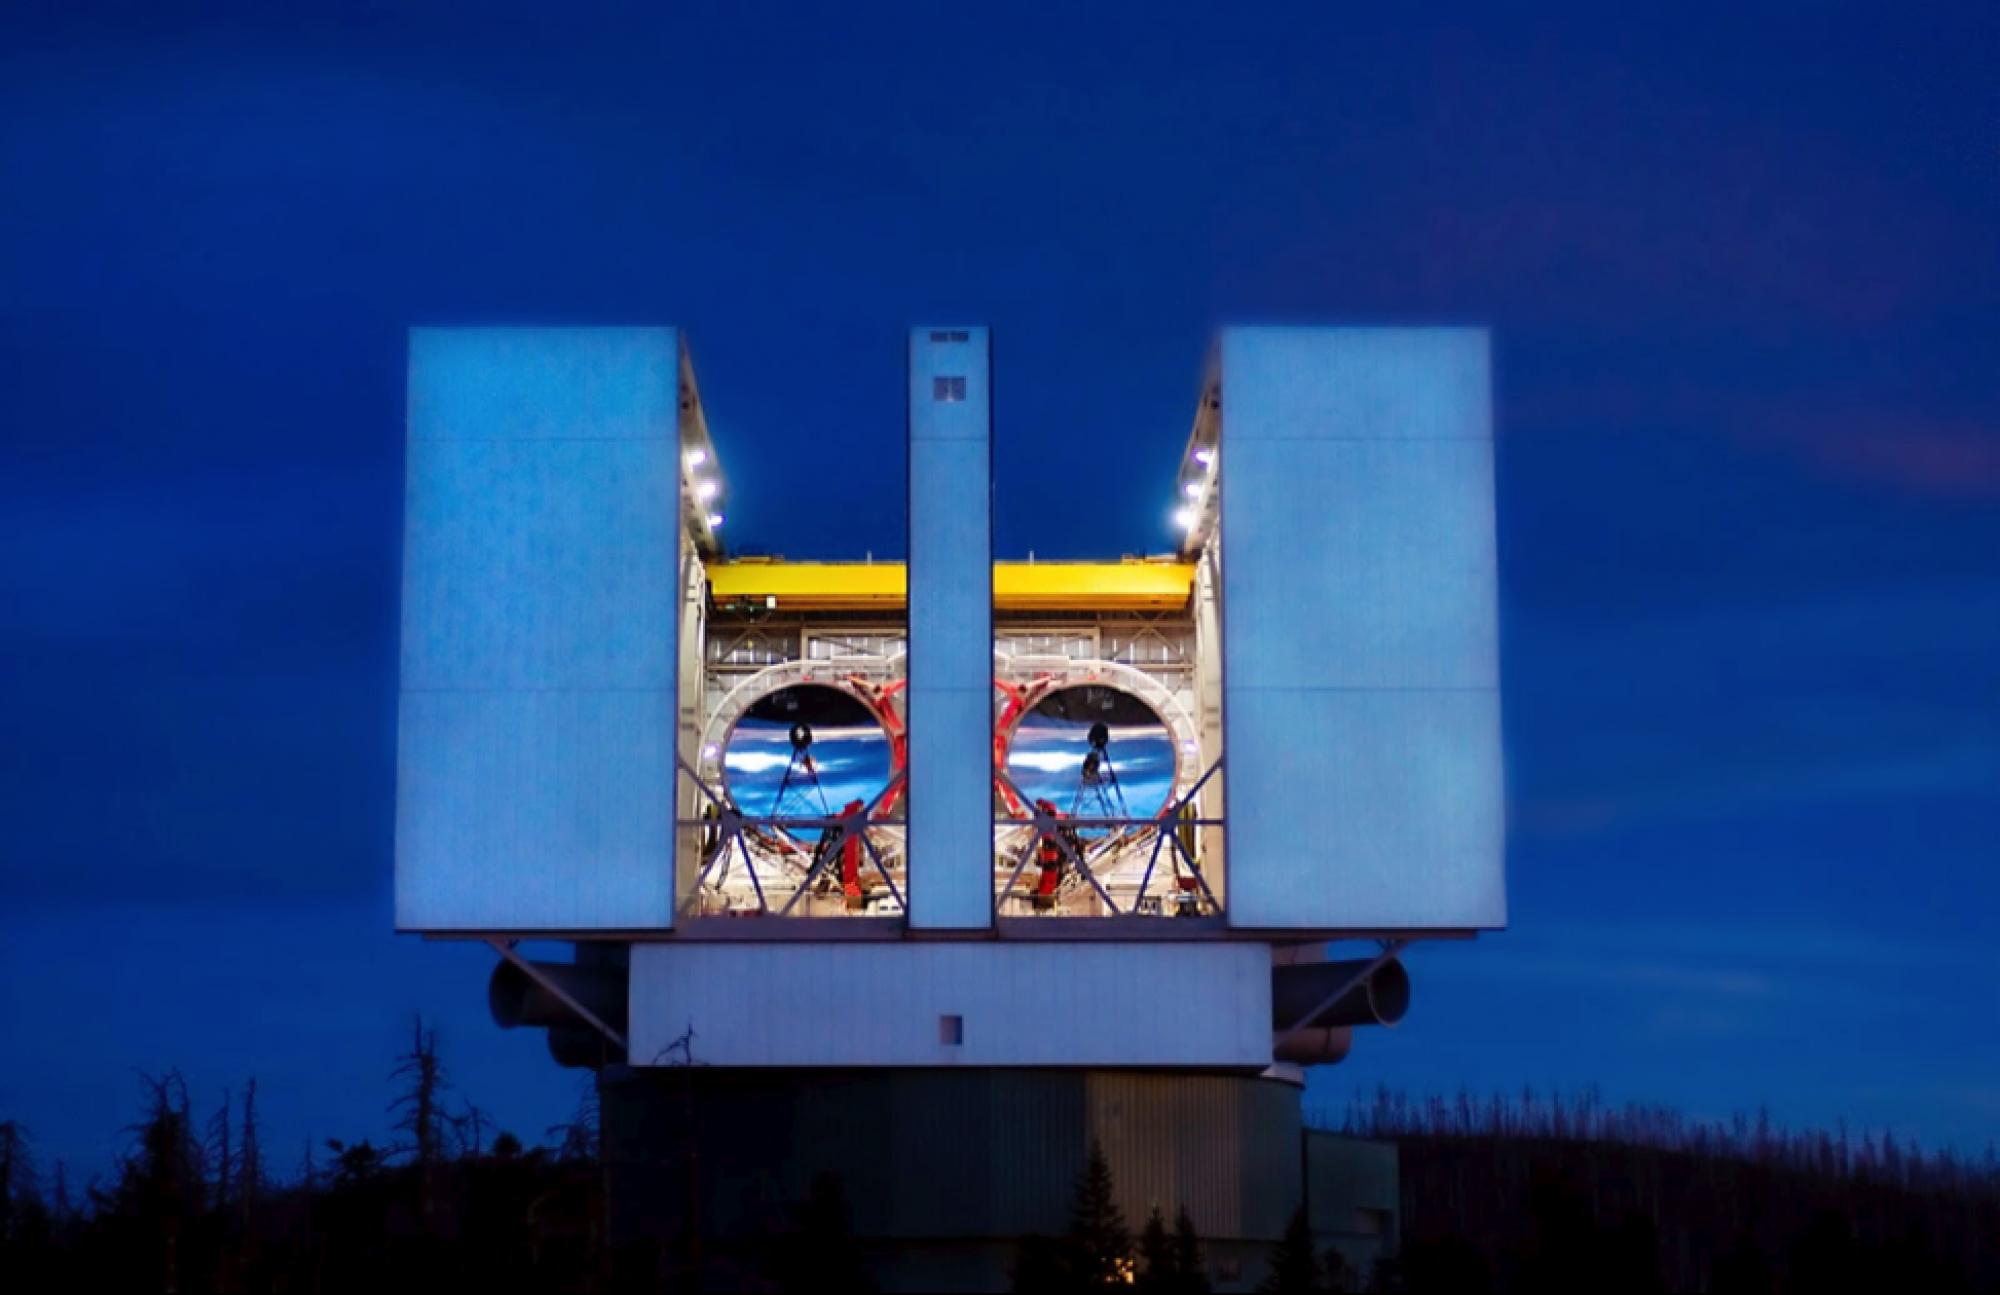 The Large Binocular Telescope, located on Mount Graham